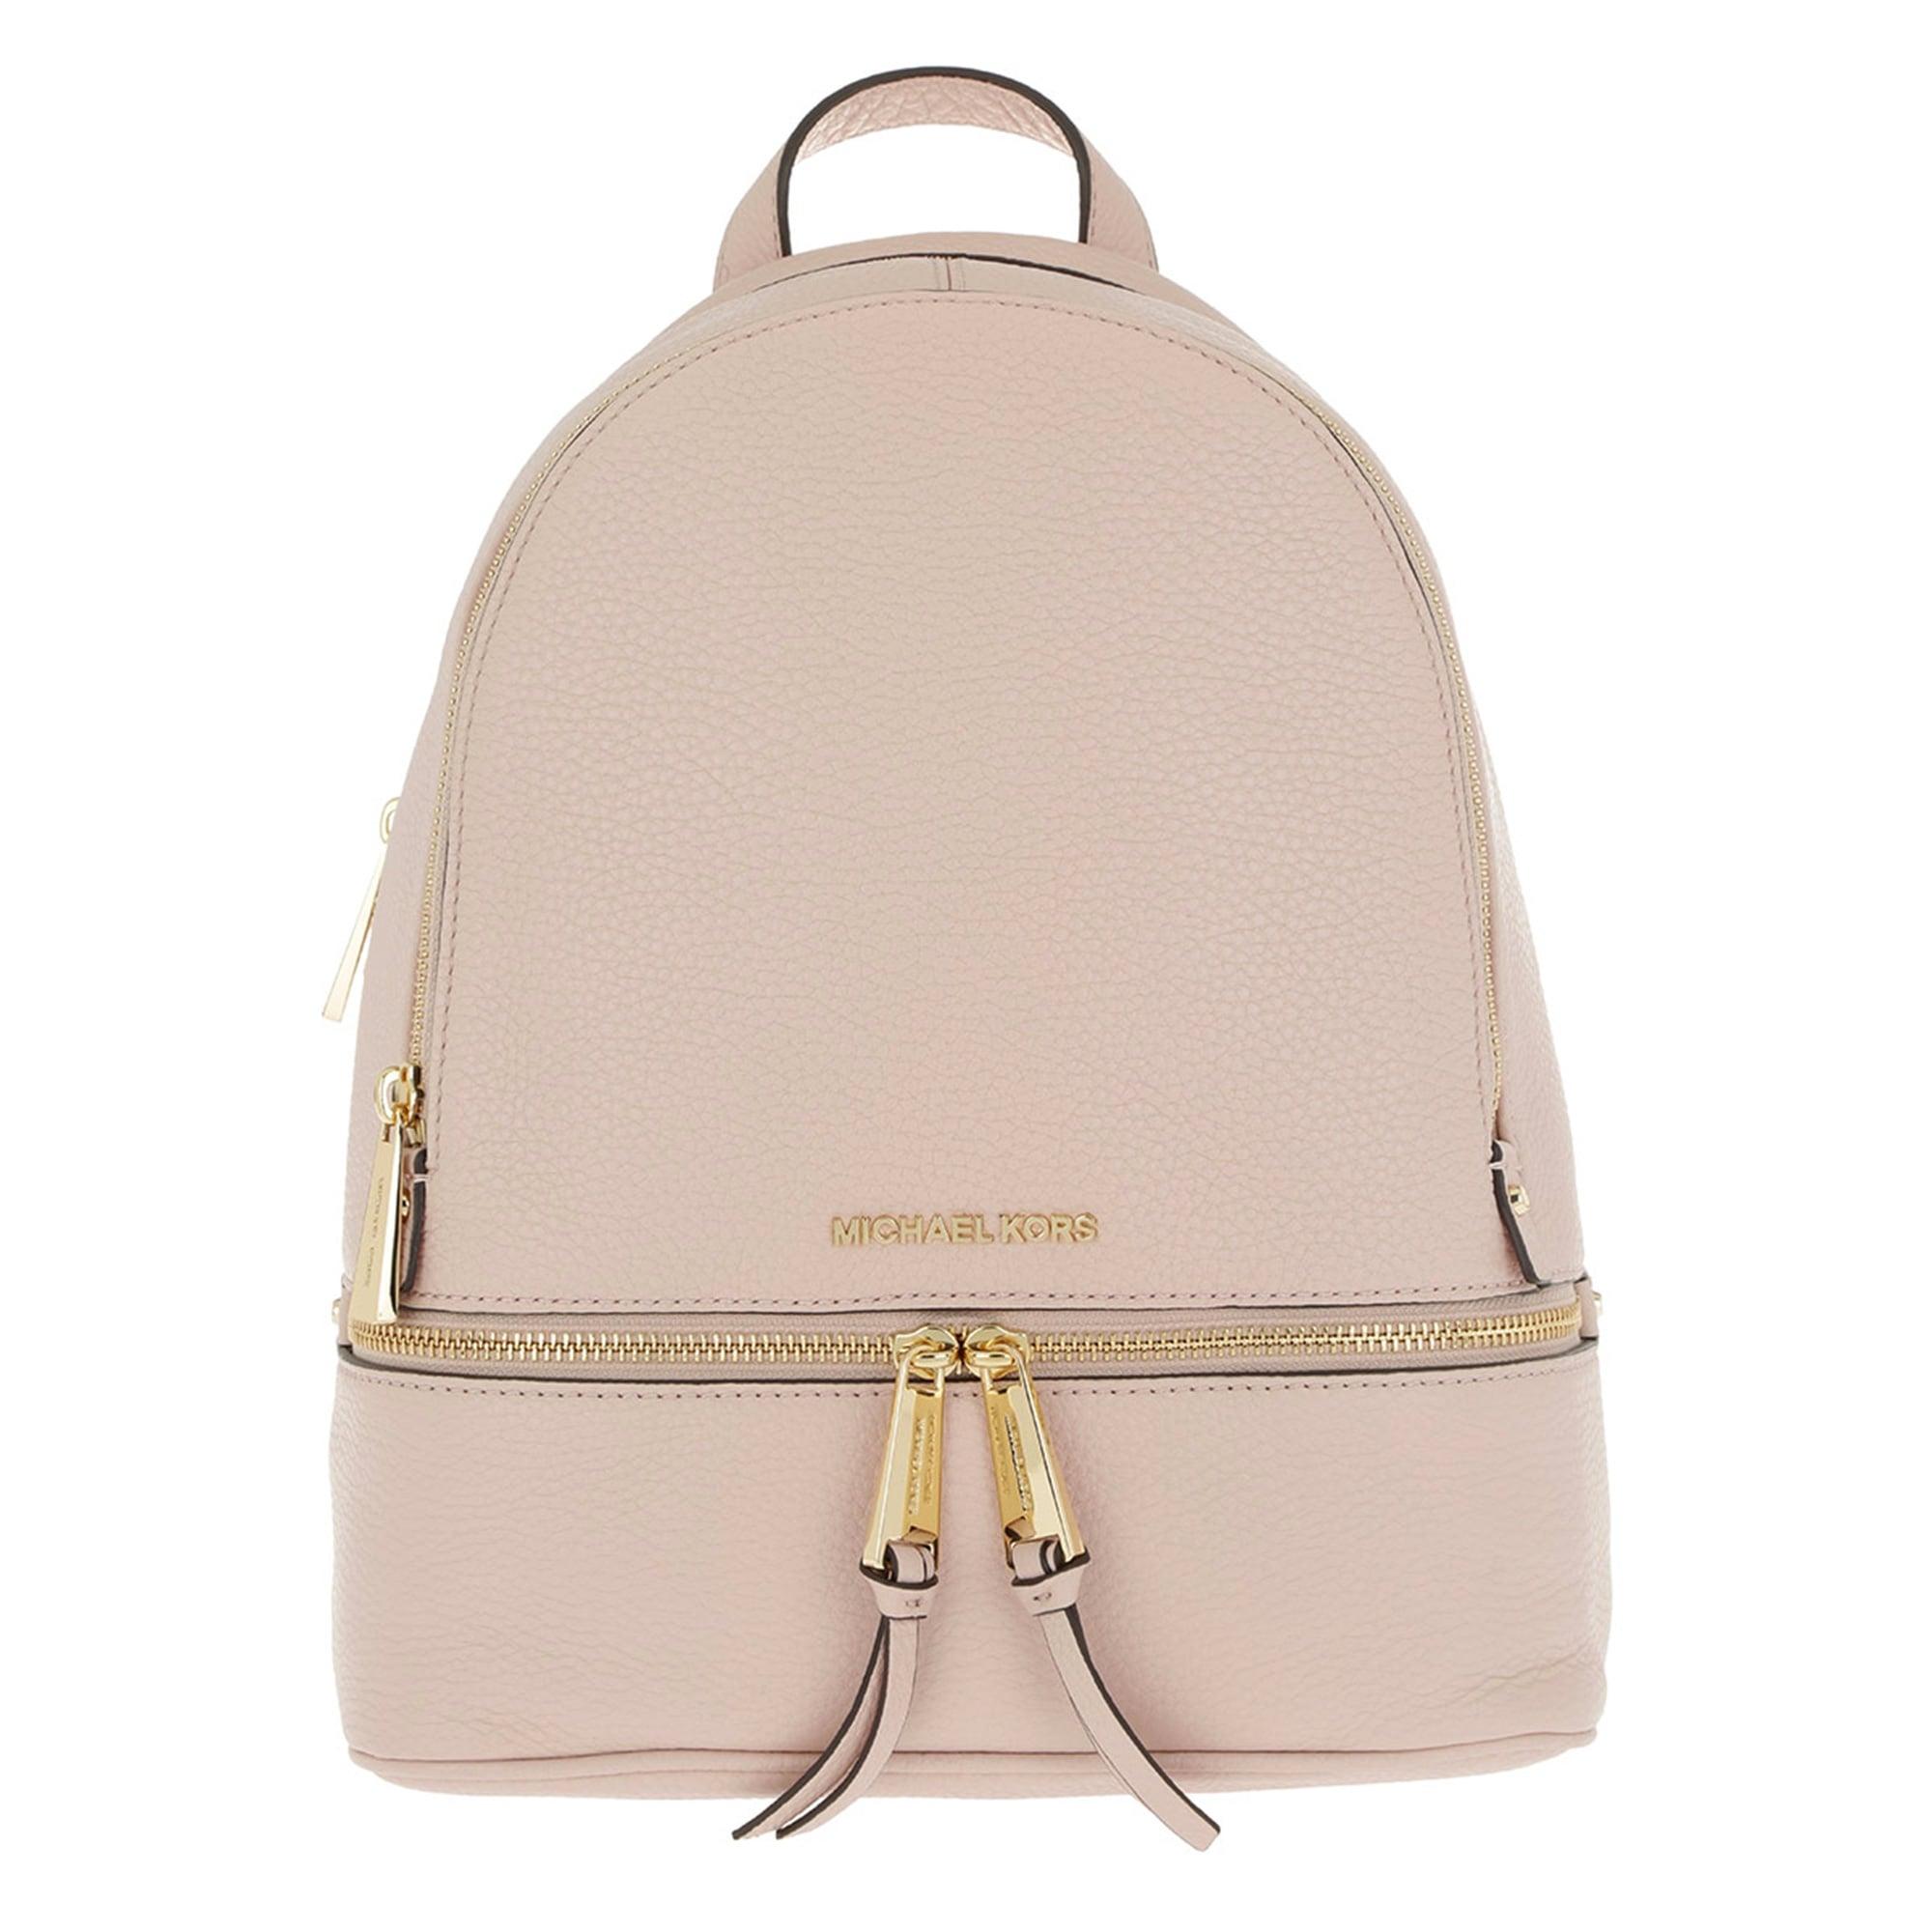 Buy white michael kors bag > OFF30% Discounted